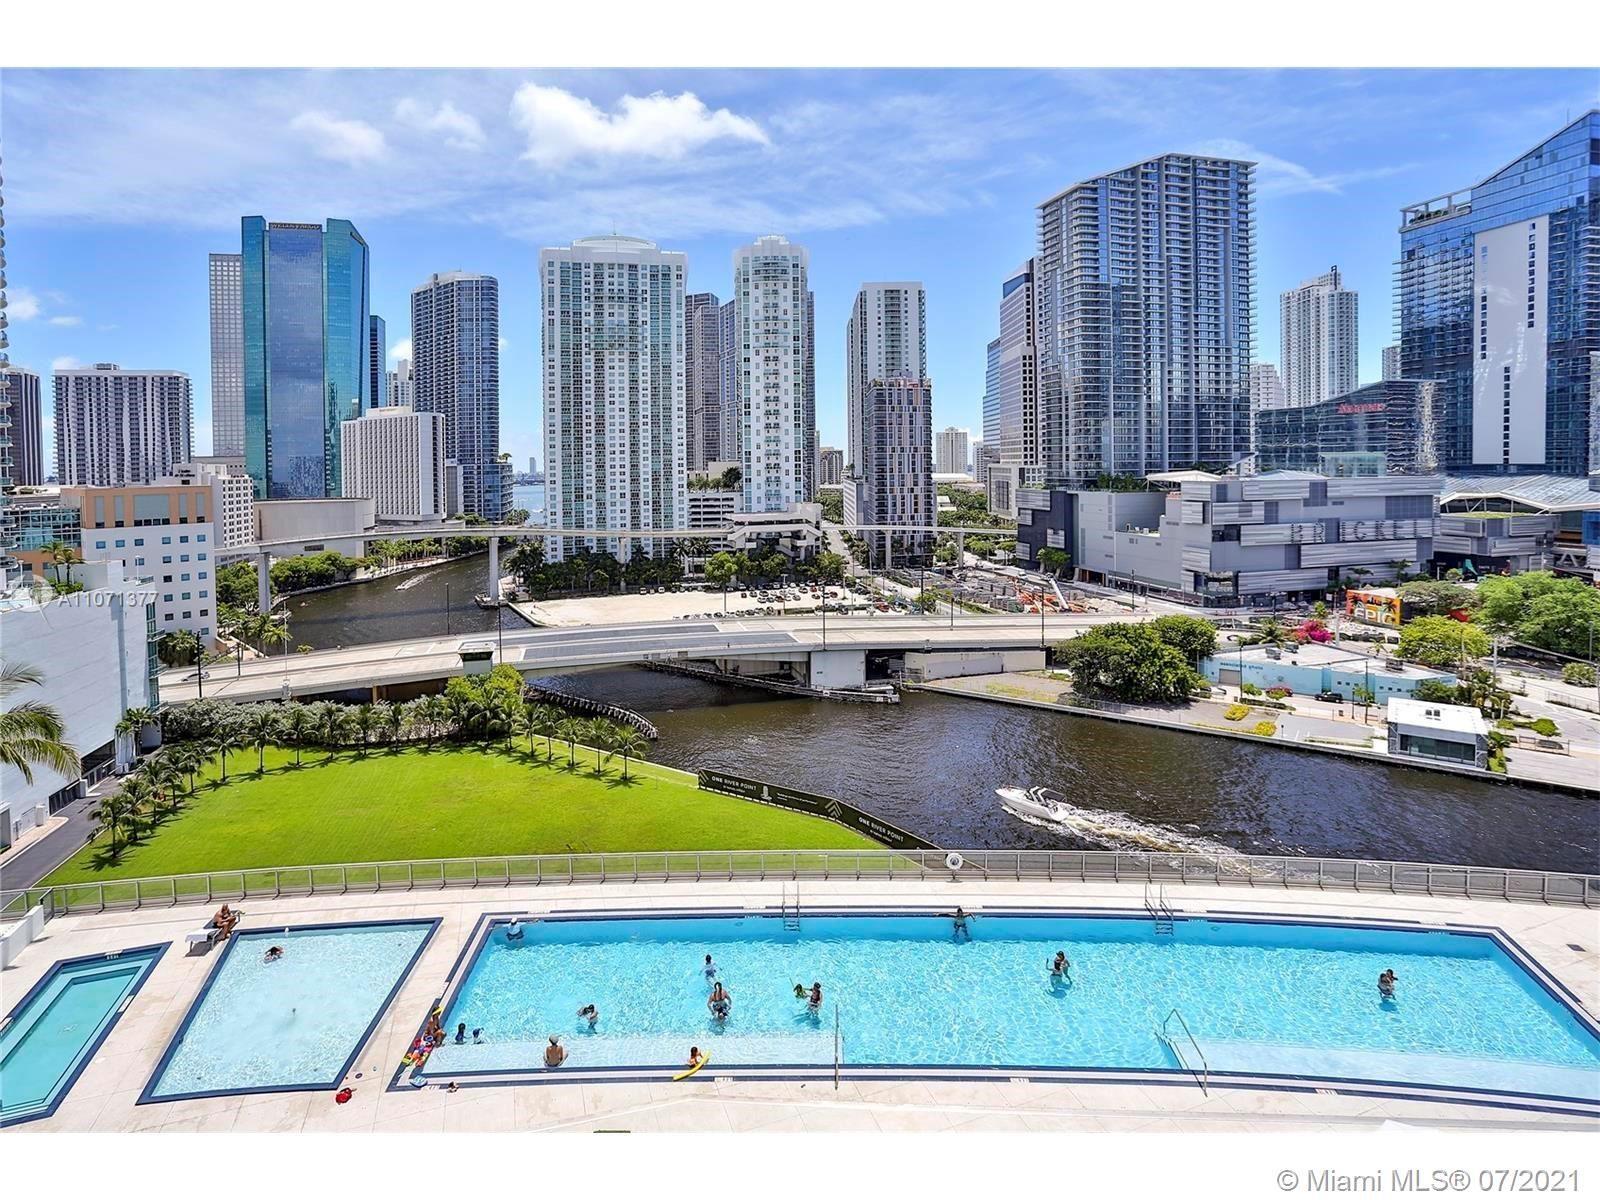 92 SW 3rd St #3611, Miami, FL 33130 - #: A11071377